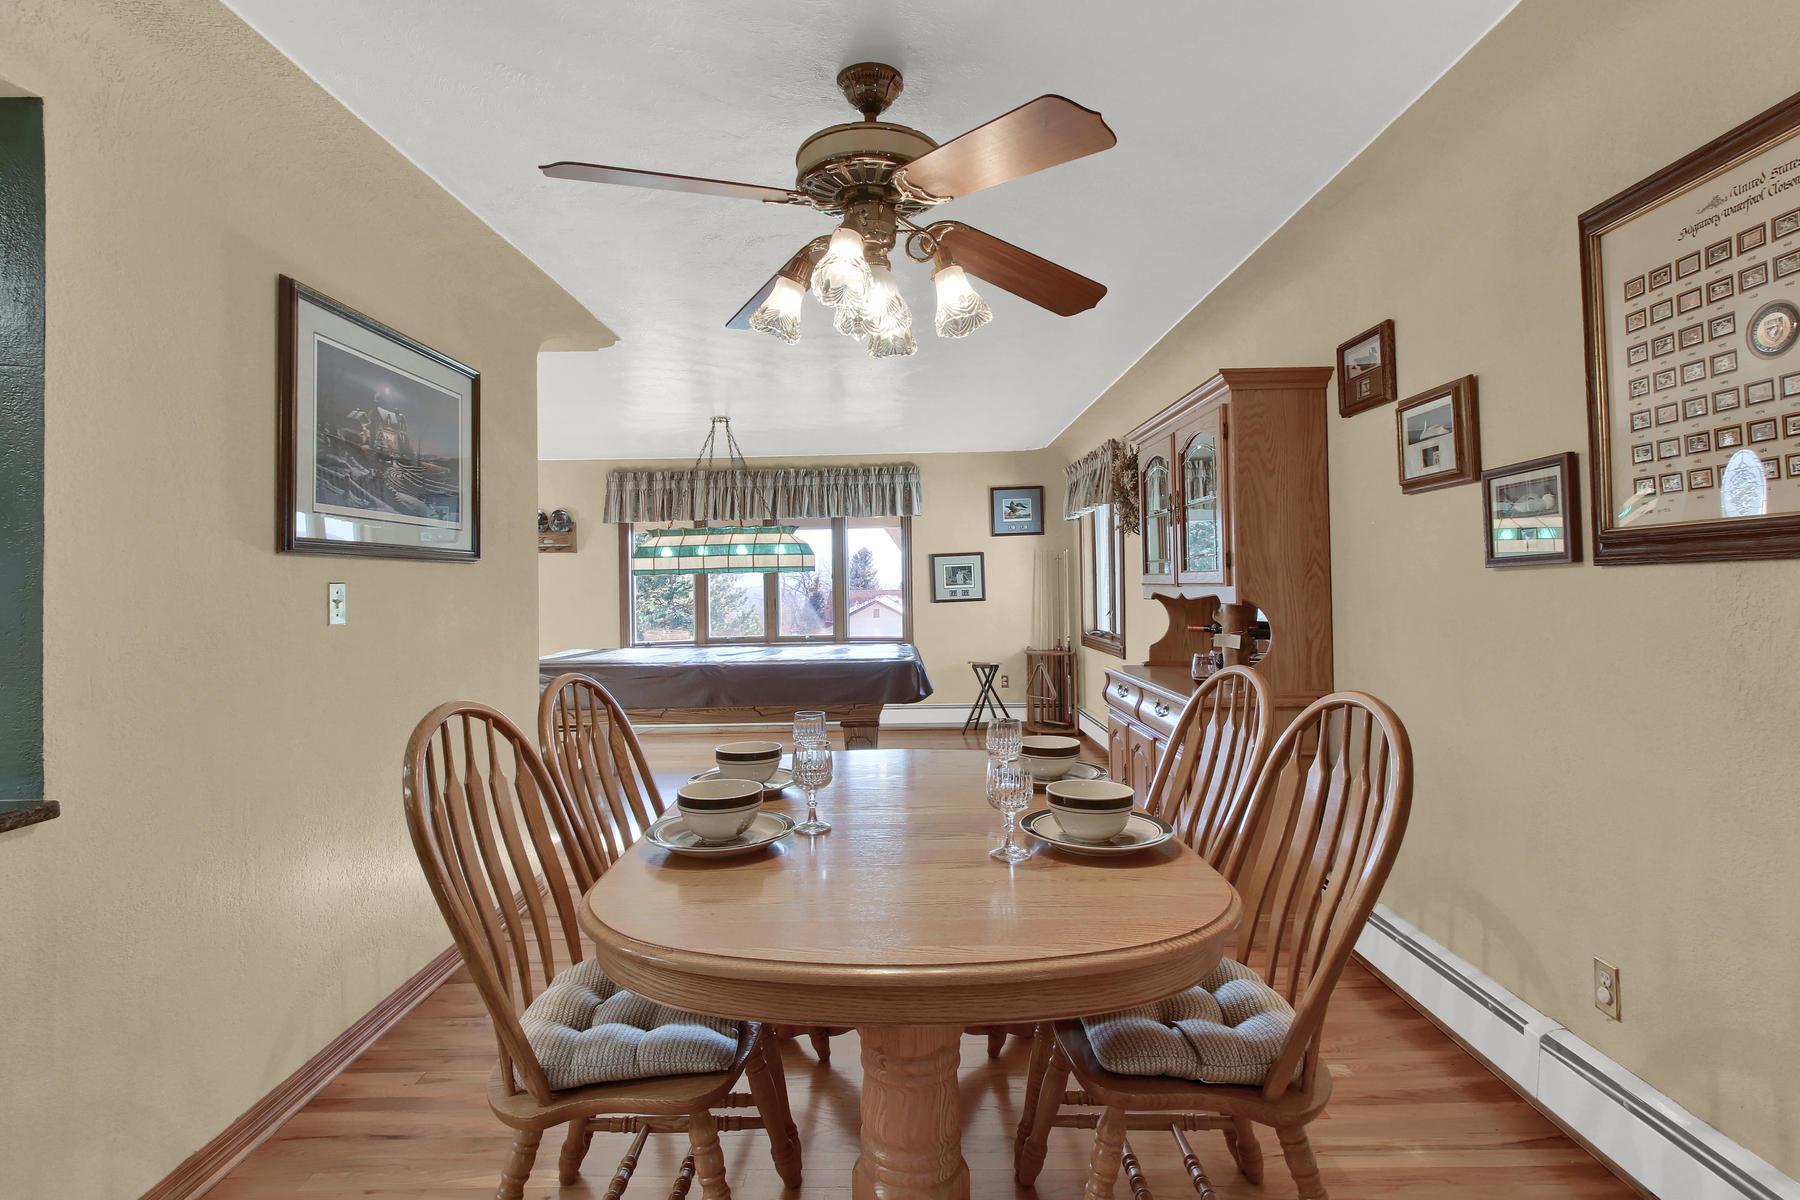 11415 W 76th Way Arvada CO-022-11-Dining Room-MLS_Size.jpg